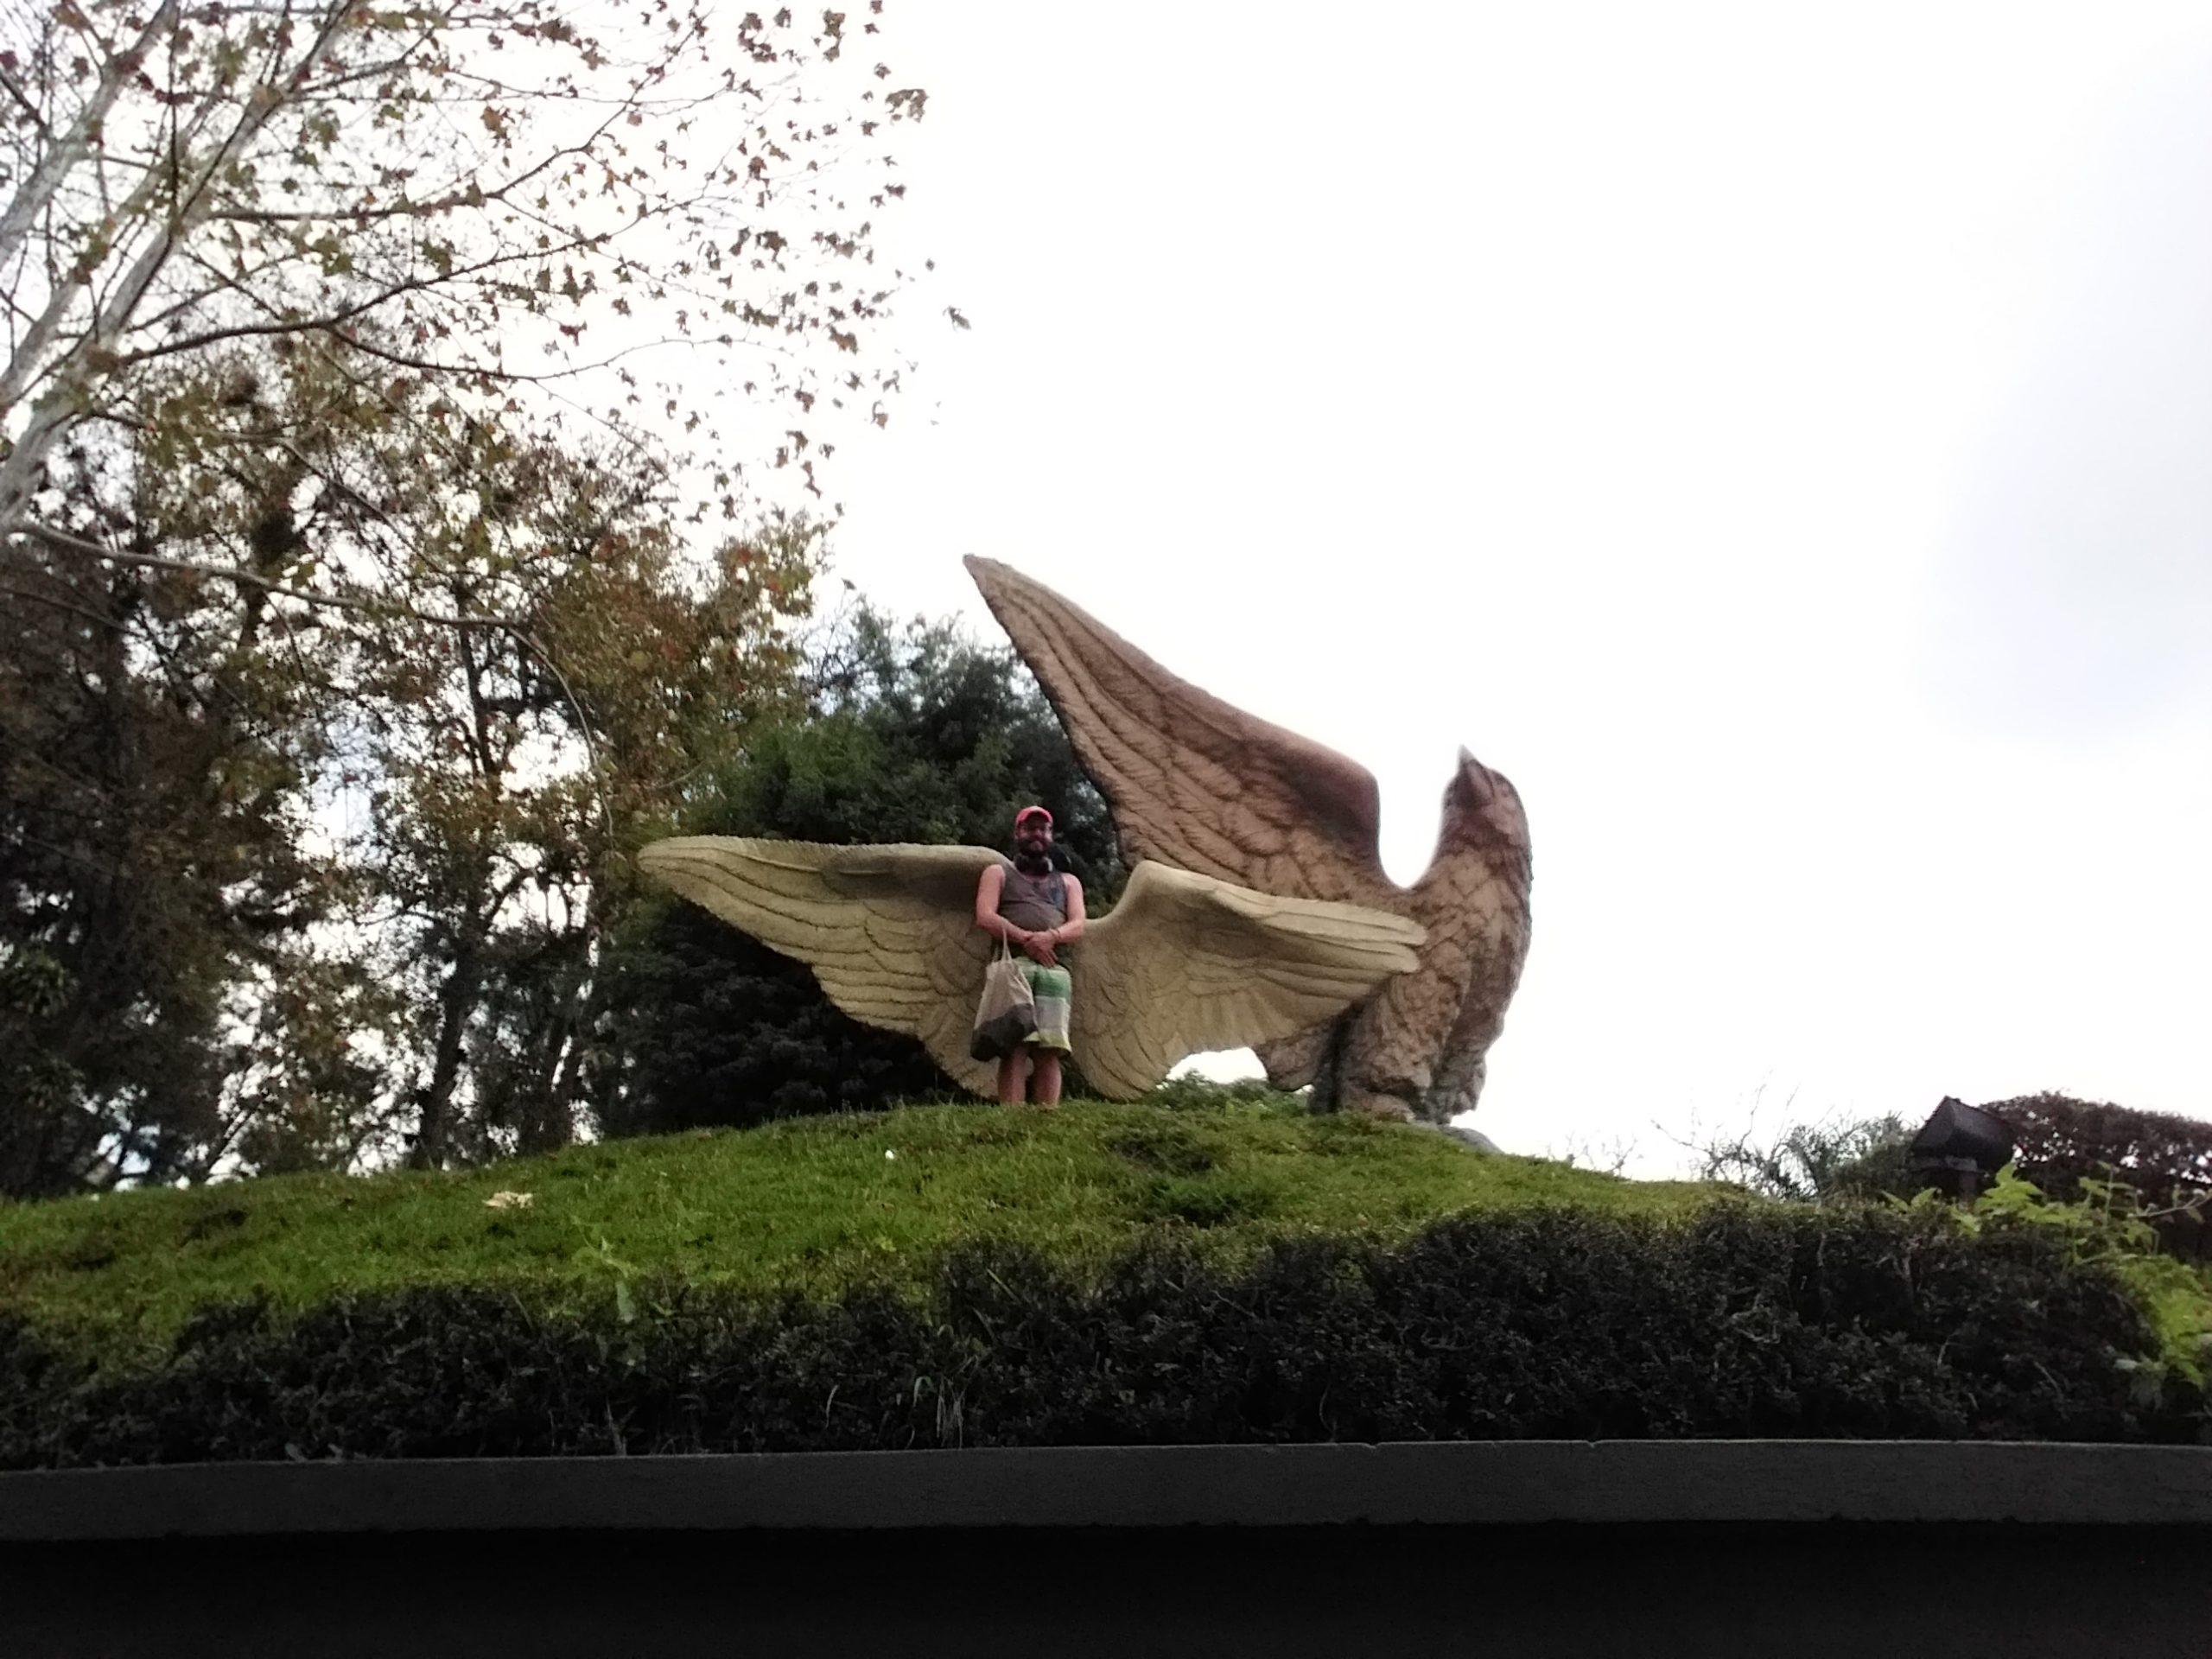 Statue aigle xalapa